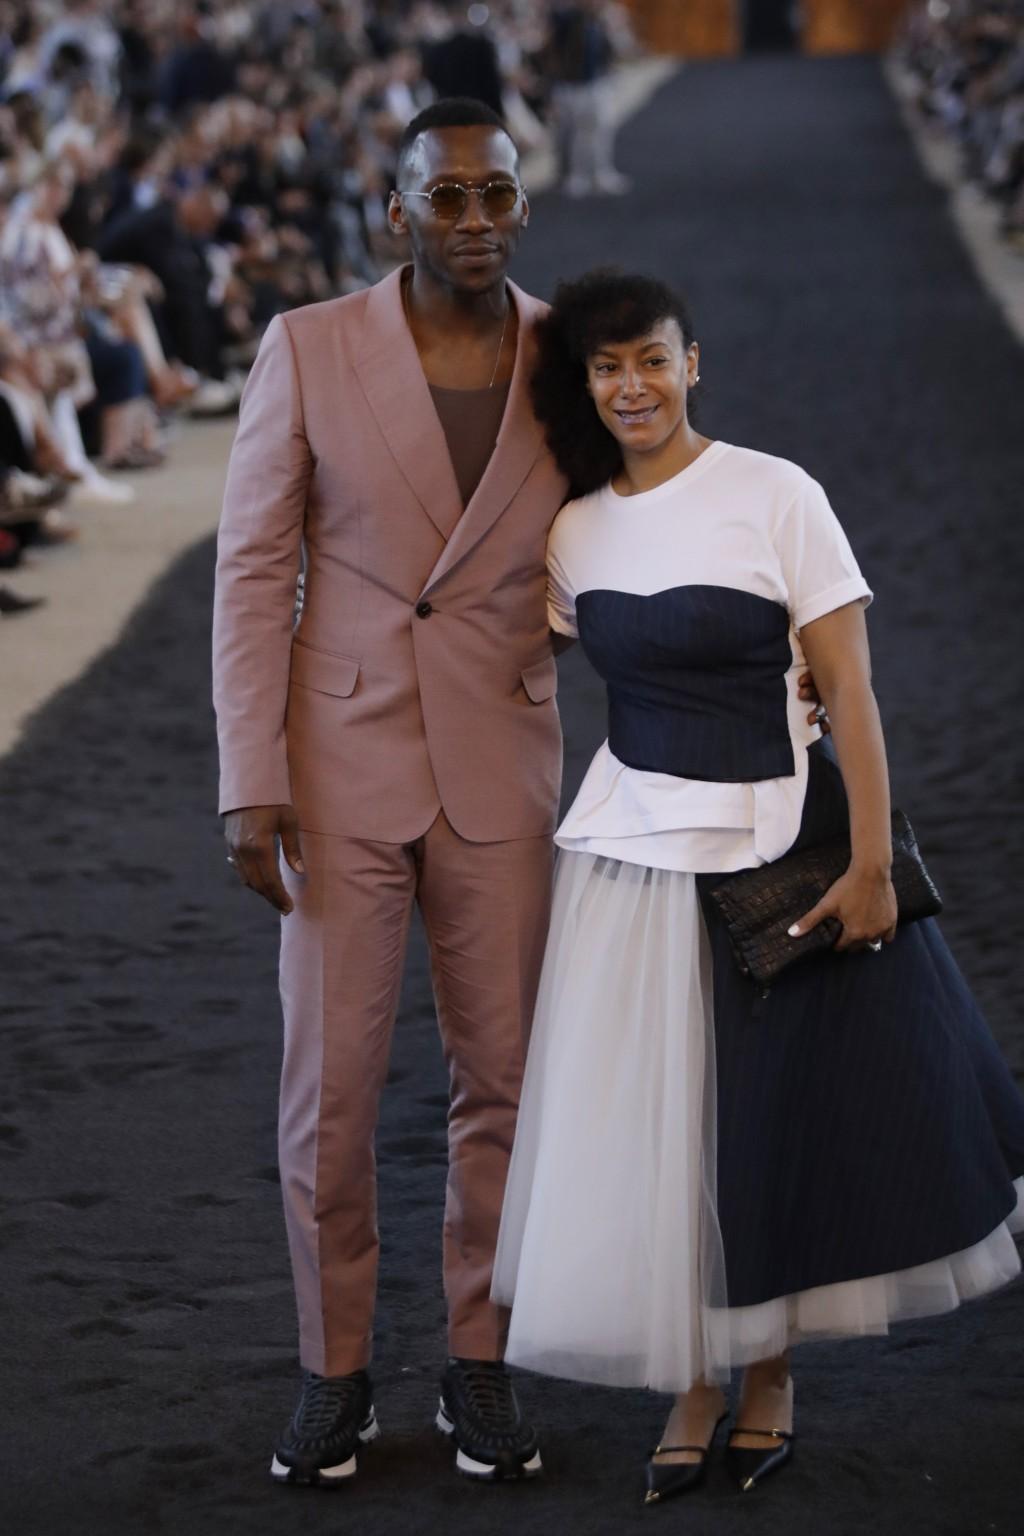 Actor Mahershala Ali, left, and his wife Amatus Sami-Karim arrive ahead of the Ermenegildo Zegna men's Spring-Summer 2020 collection, unveiled during